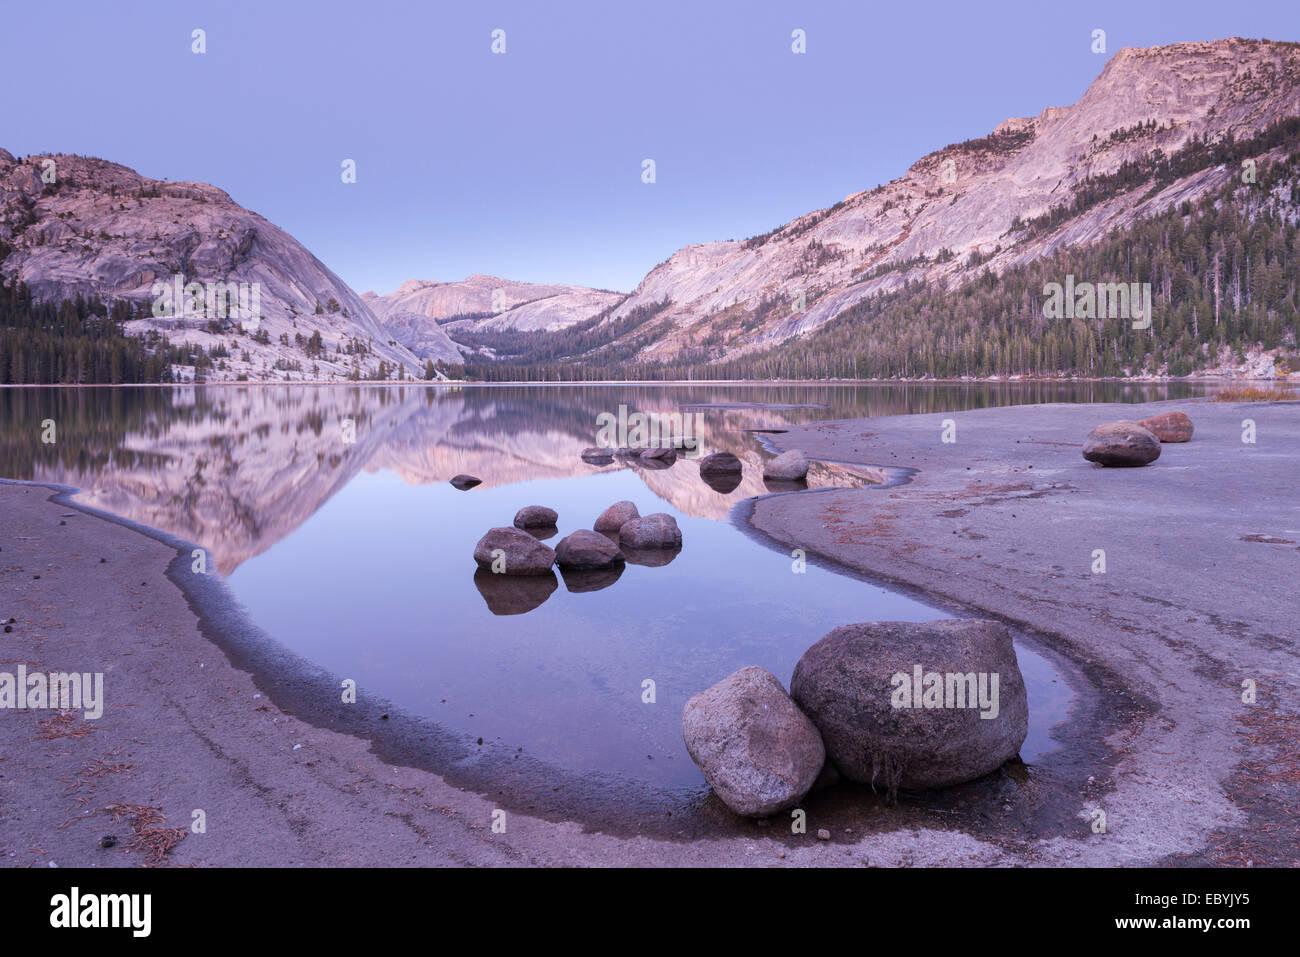 Twilight à Lac Tenaya, Yosemite National Park, California, USA. L'automne (octobre) 2013. Banque D'Images